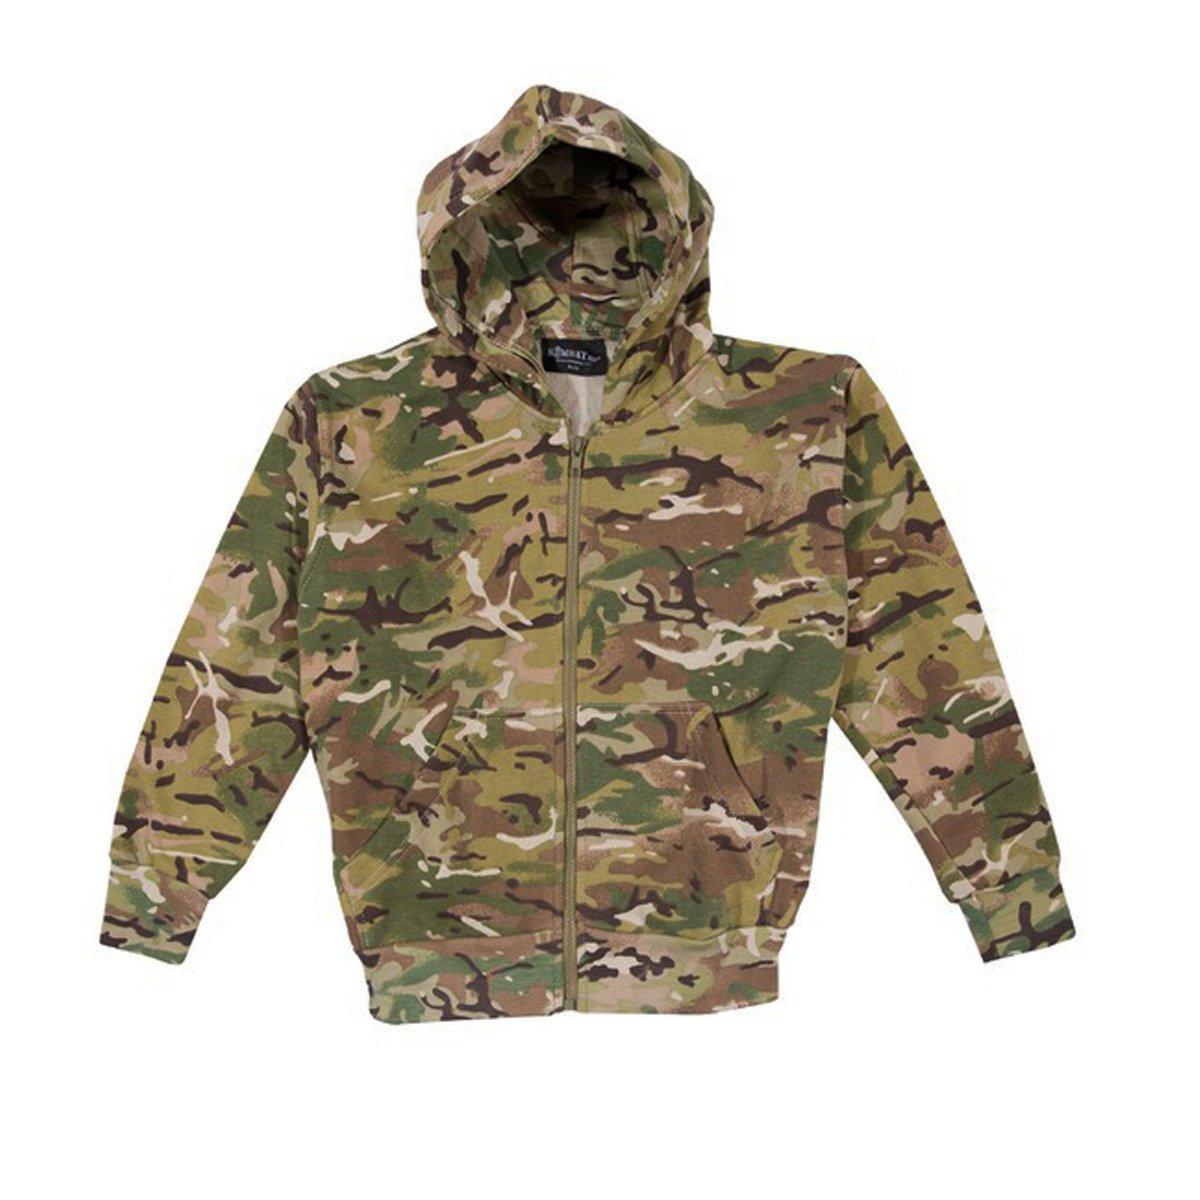 Kombat Kids Army Style Hoodie BTP Camo Airsoft Cadet COMBAT